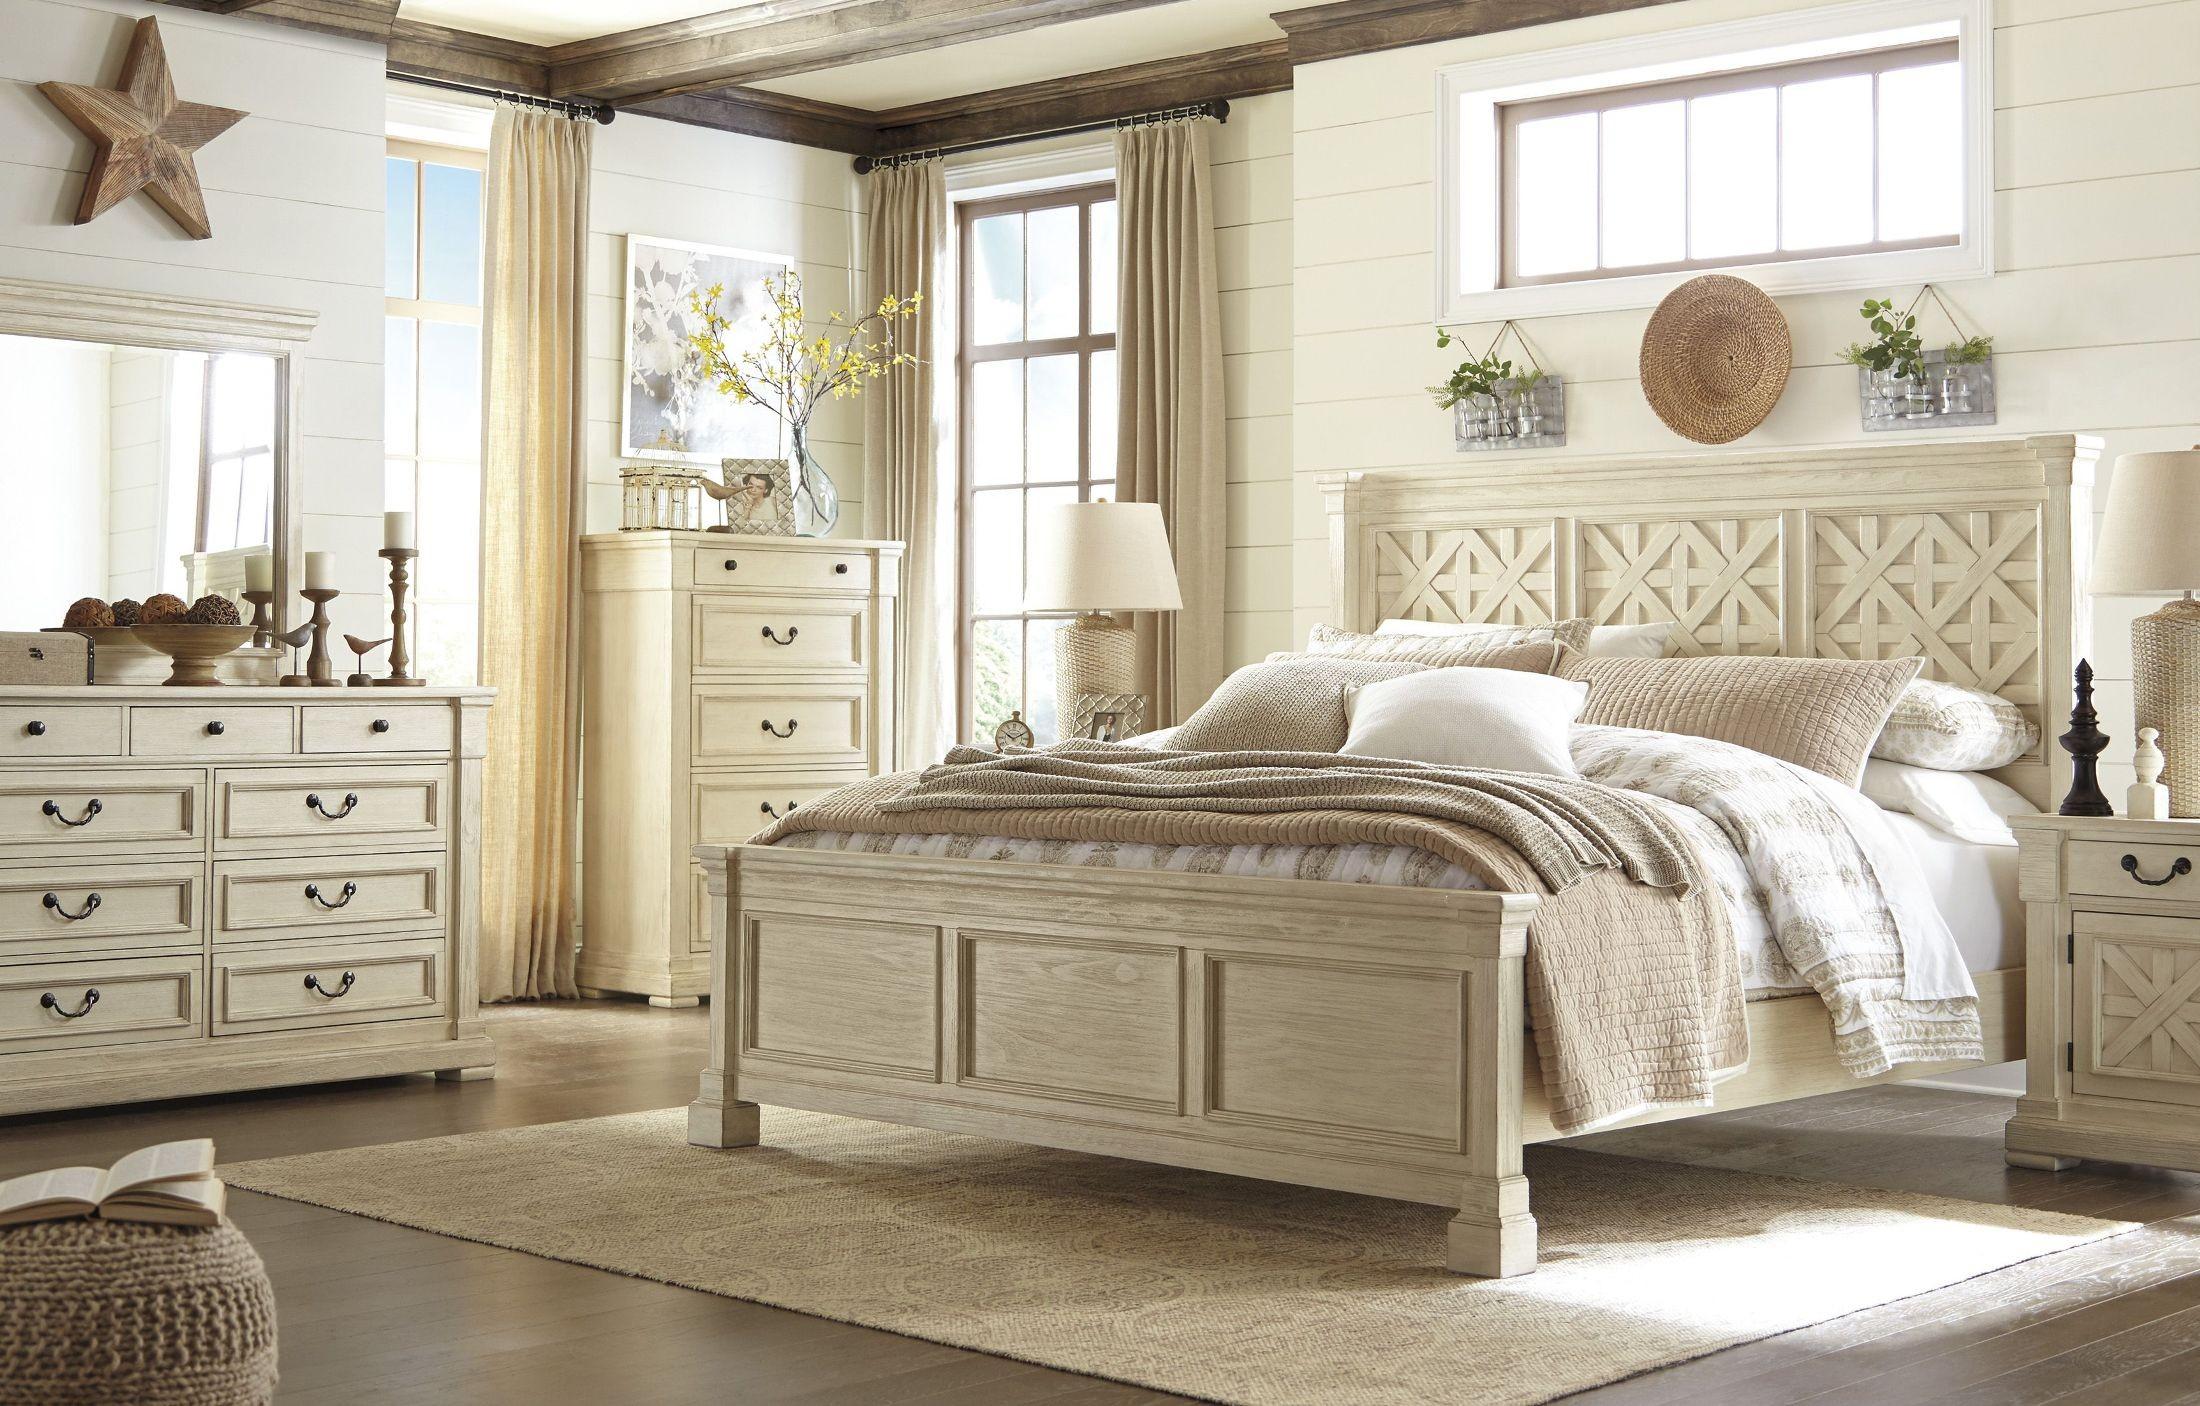 Bolanburg White King Panel Bed B647 56 58 97 Ashley